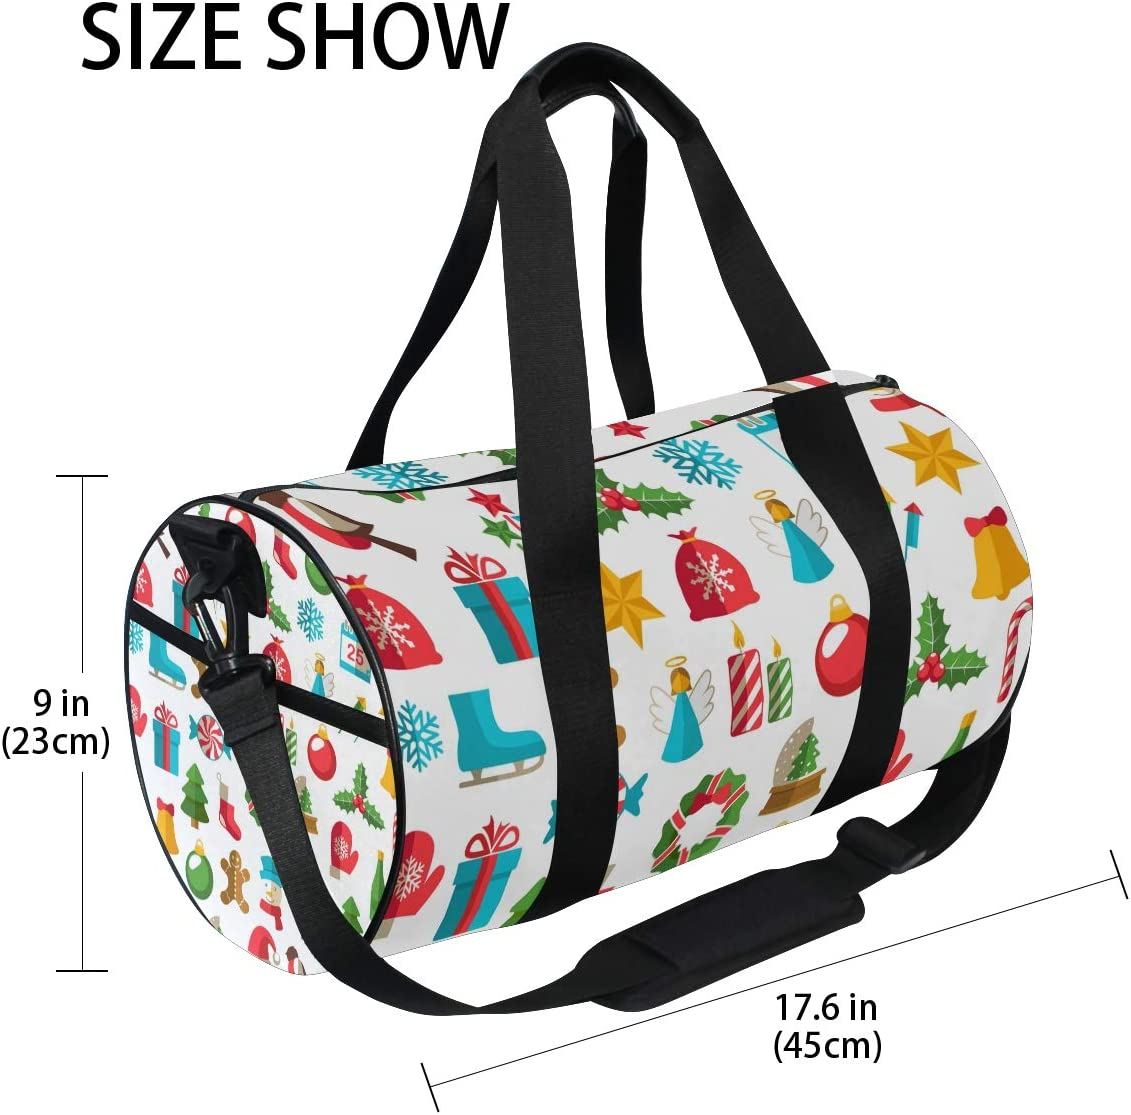 MALPLENA Merry Christmas December 25Th Drum gym duffel bag women Travel Bag